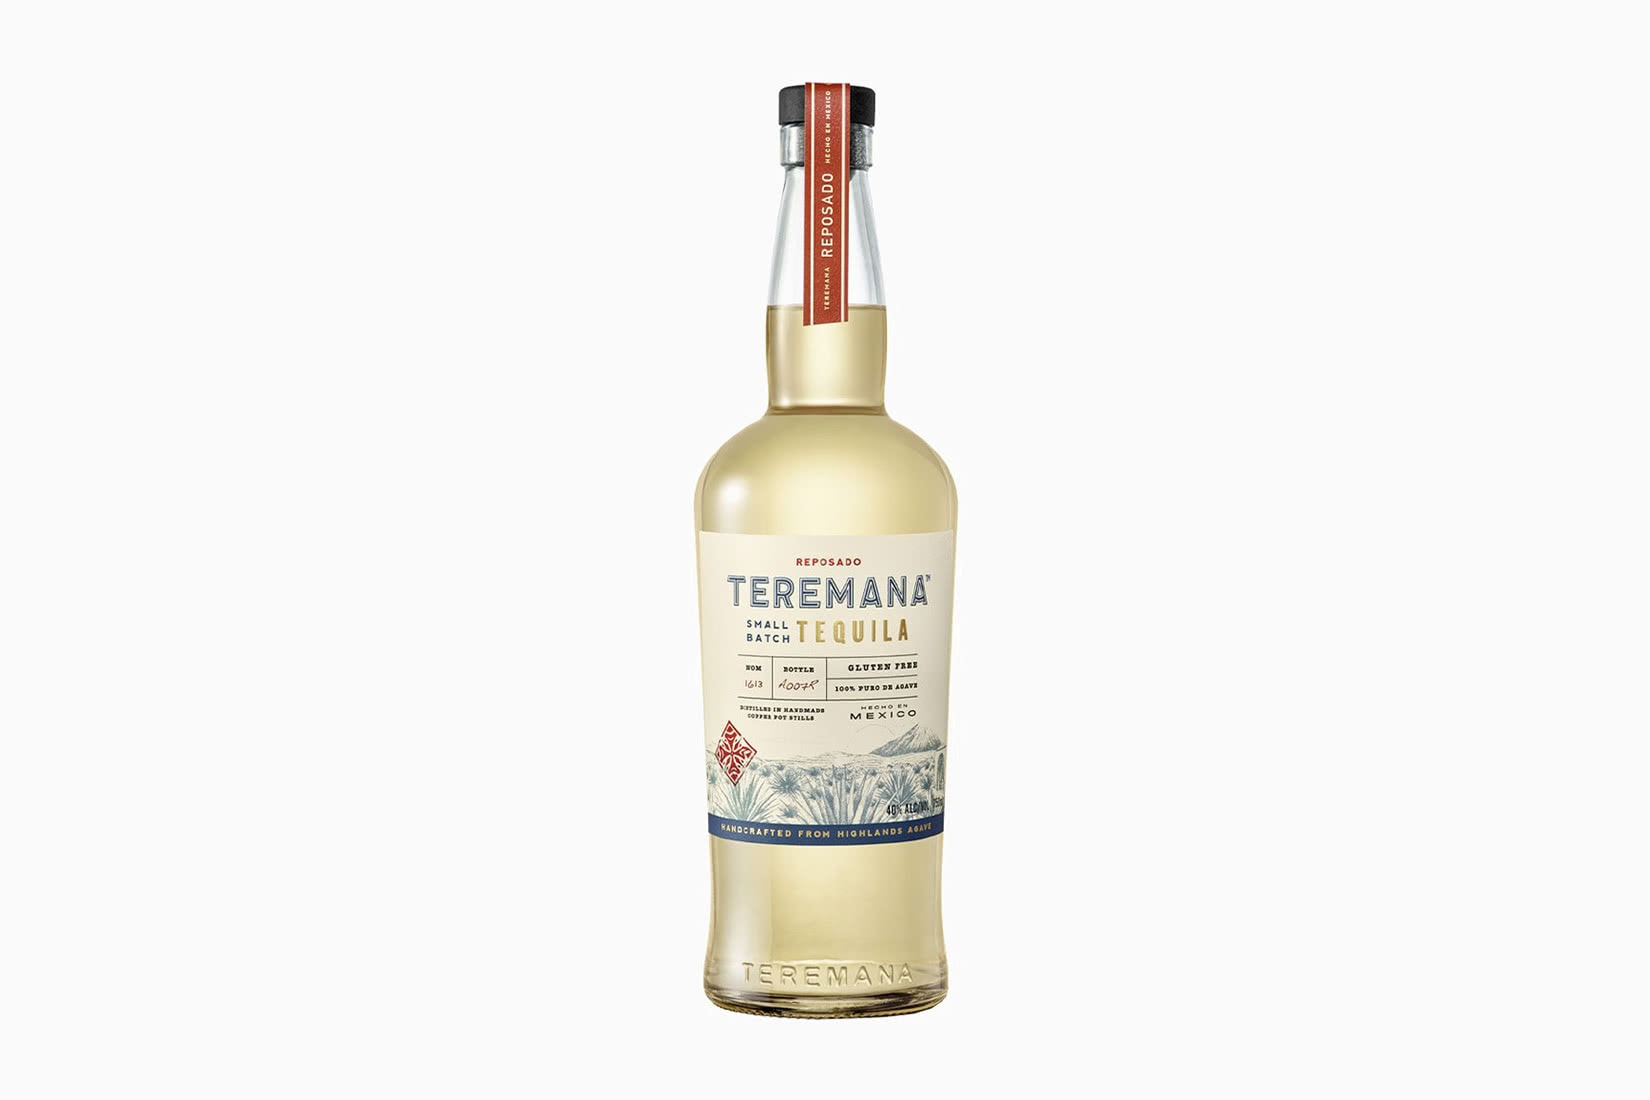 teremana tequila reposado botella precio tamaño revisión - Luxe Digital